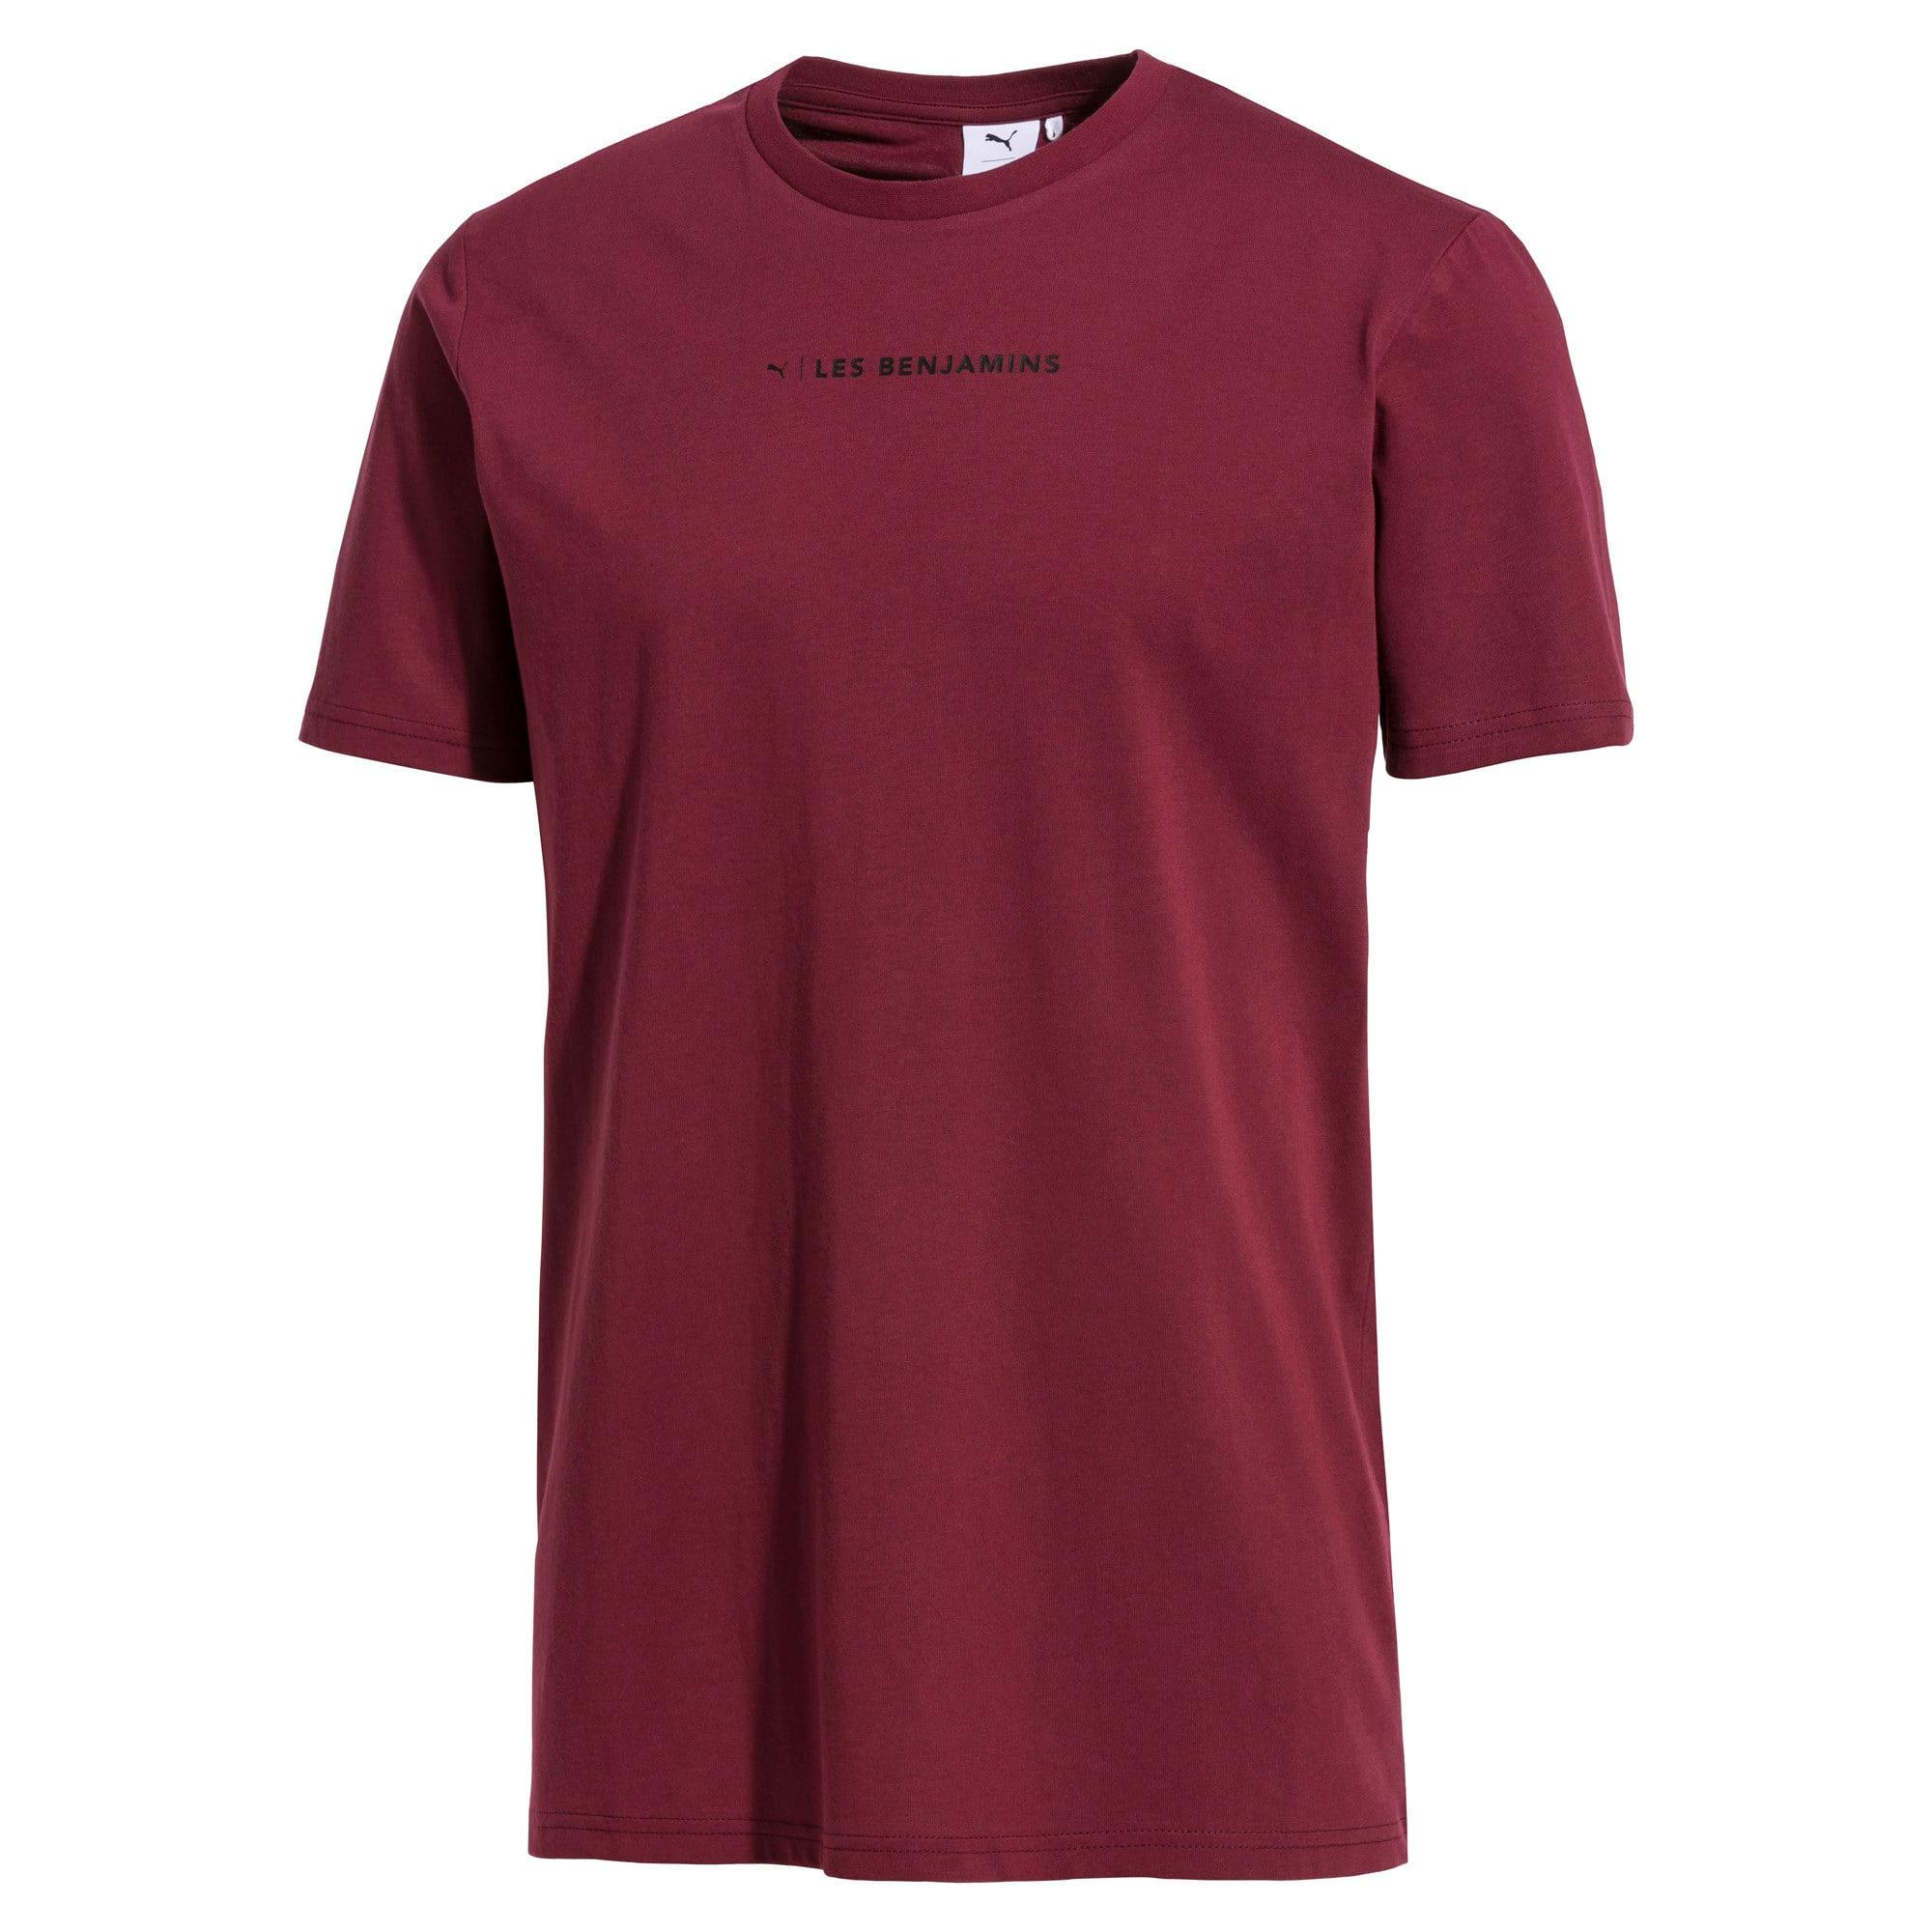 Thumbnail 1 of T-Shirt PUMA x LES BENJAMINS pour homme, Burgundy, medium